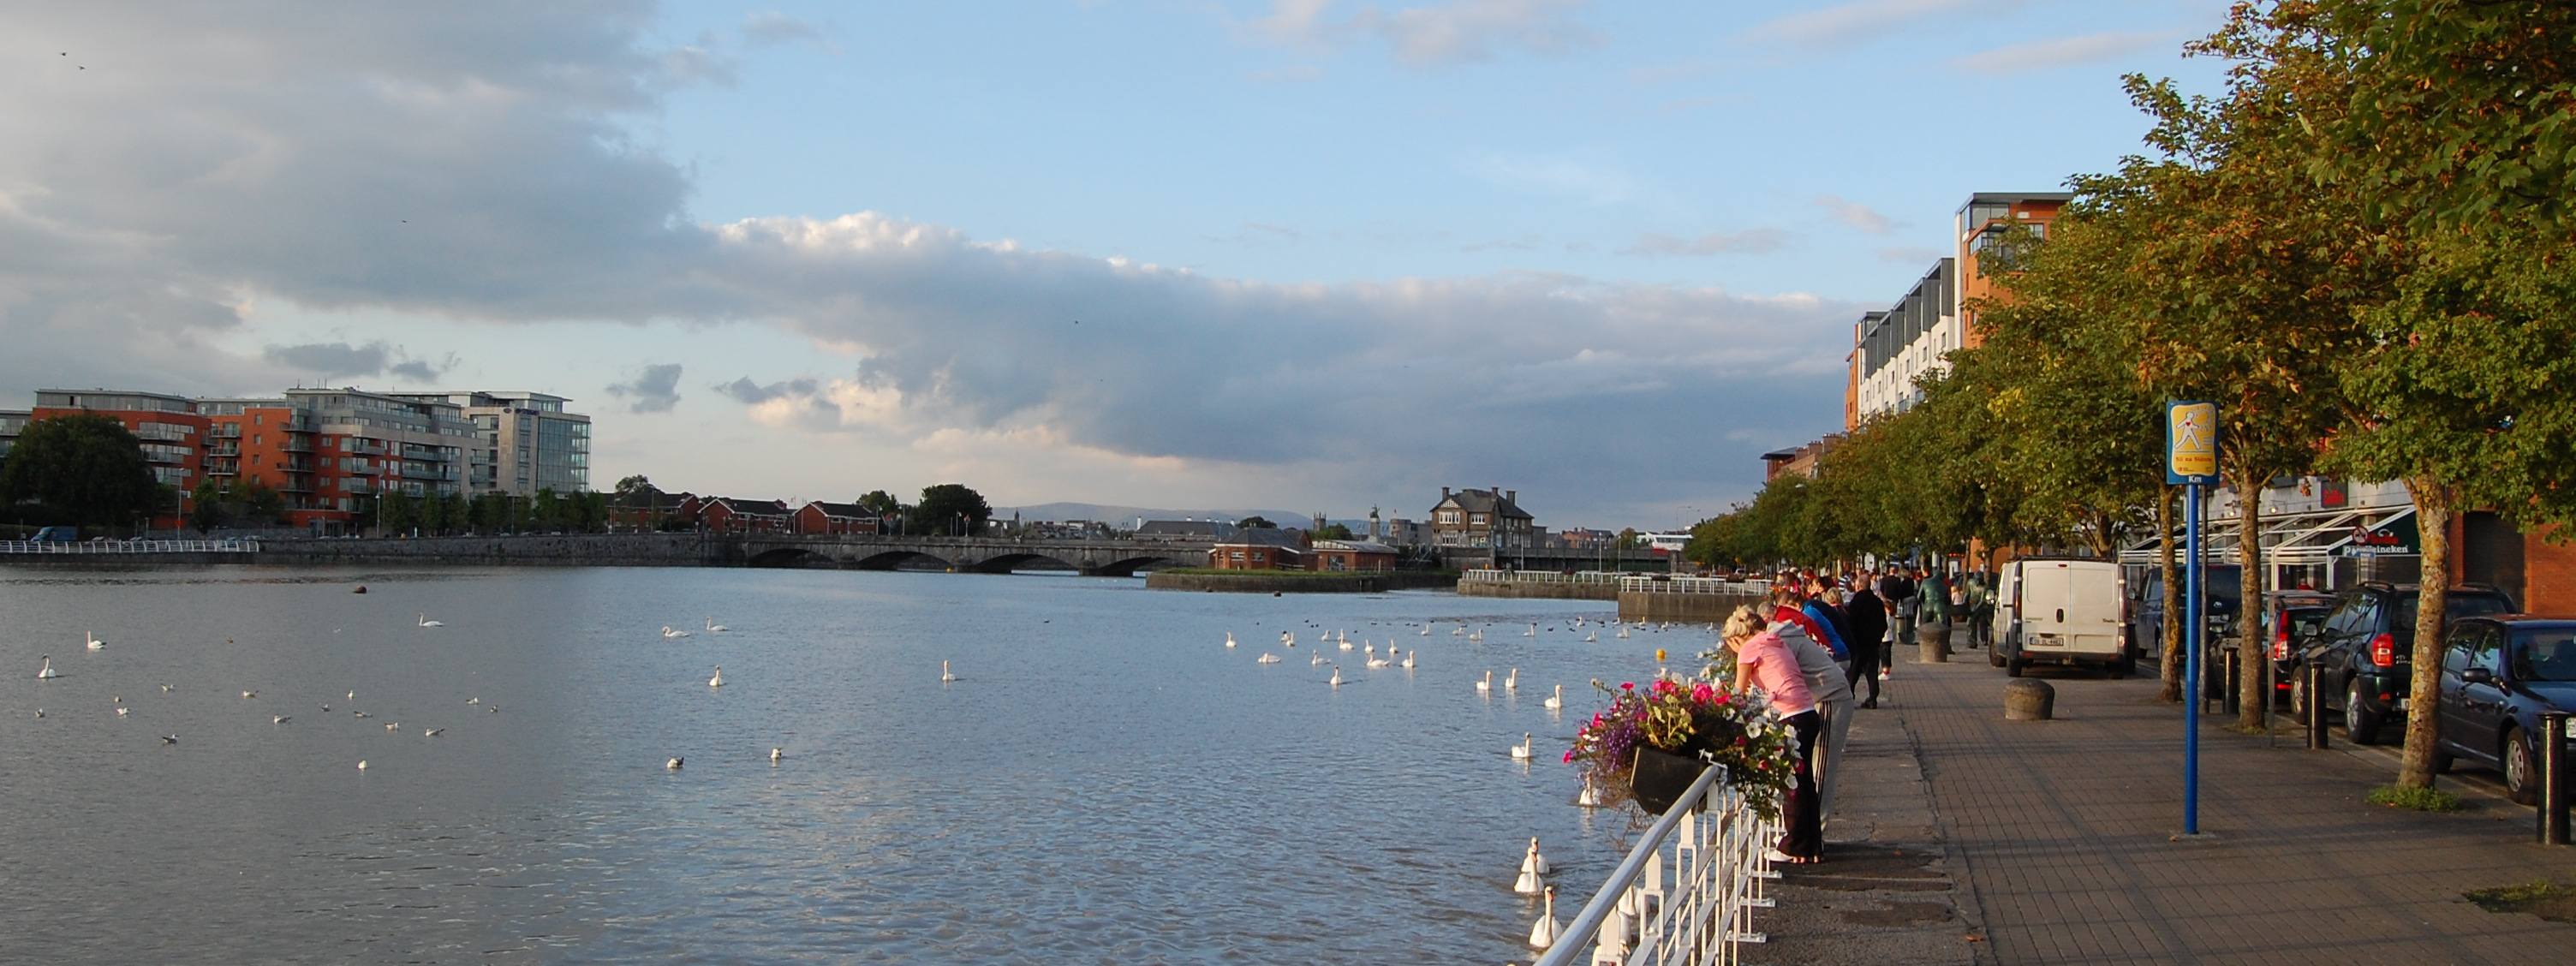 File:LimerickCity BishopsQuay.jpg - Wikimedia Commons